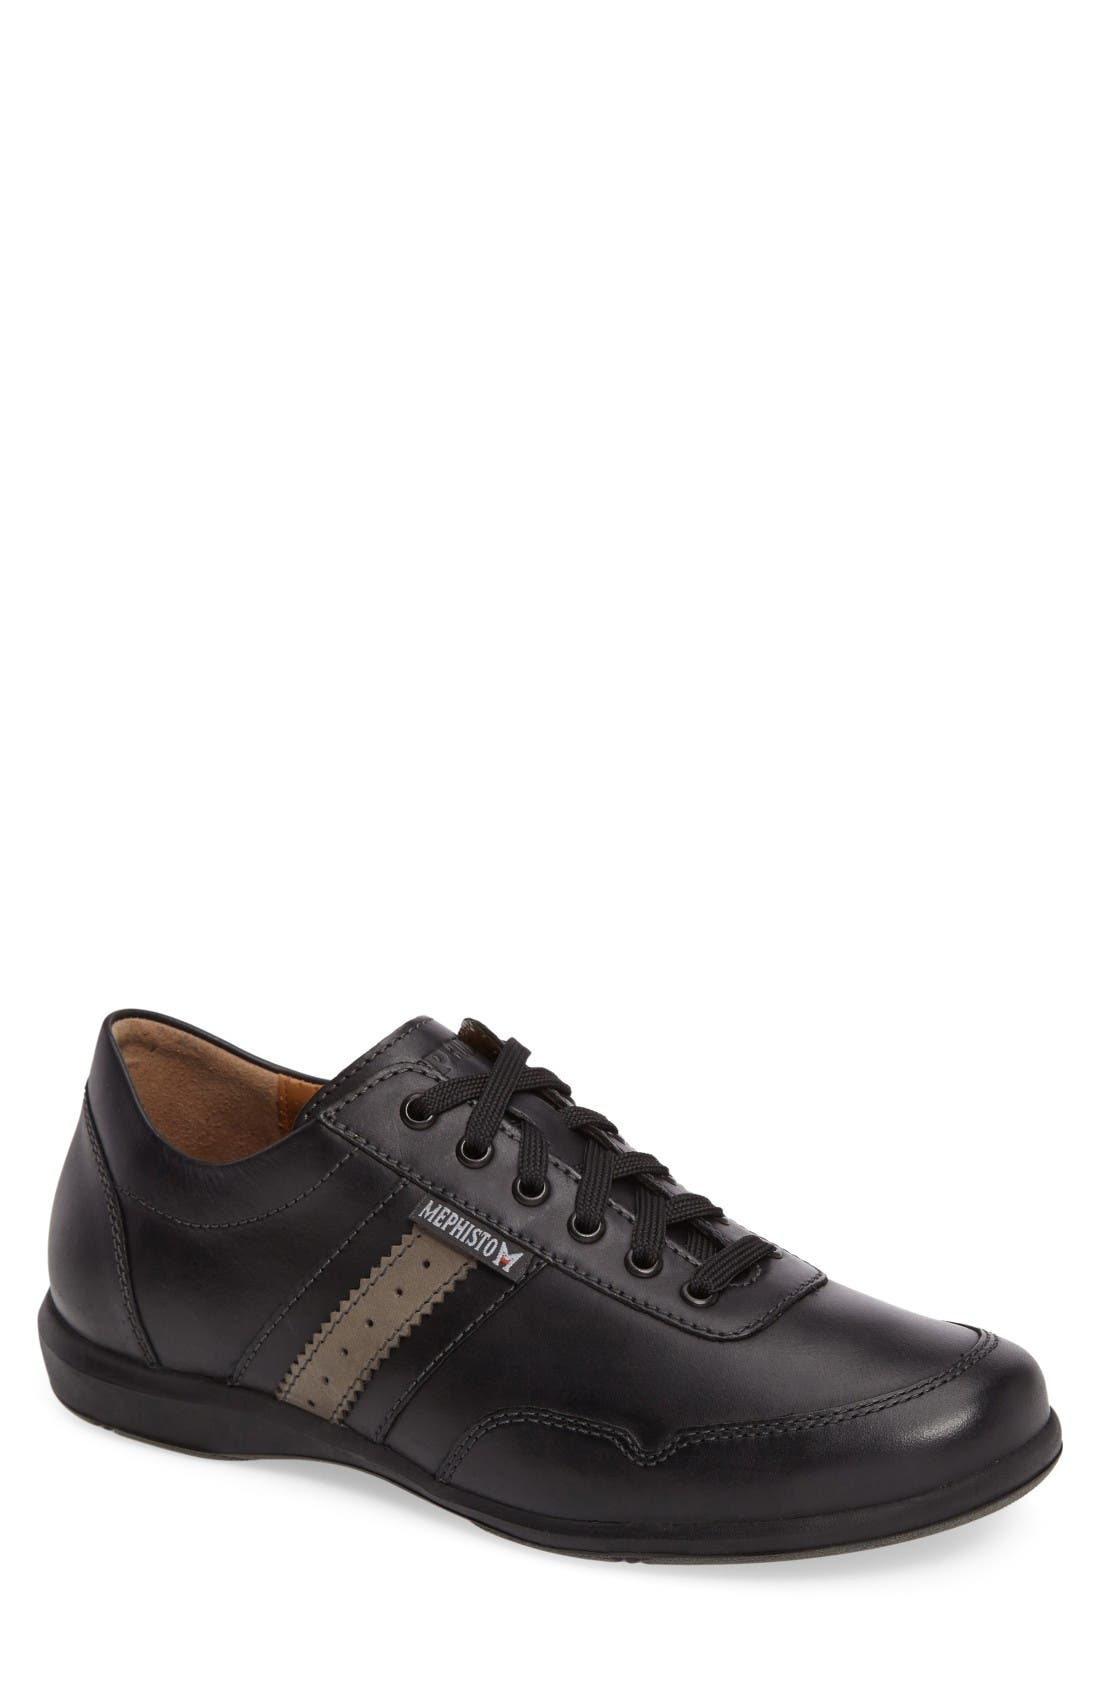 Main Image - Mephisto 'Bonito' Walking Shoe (Men)